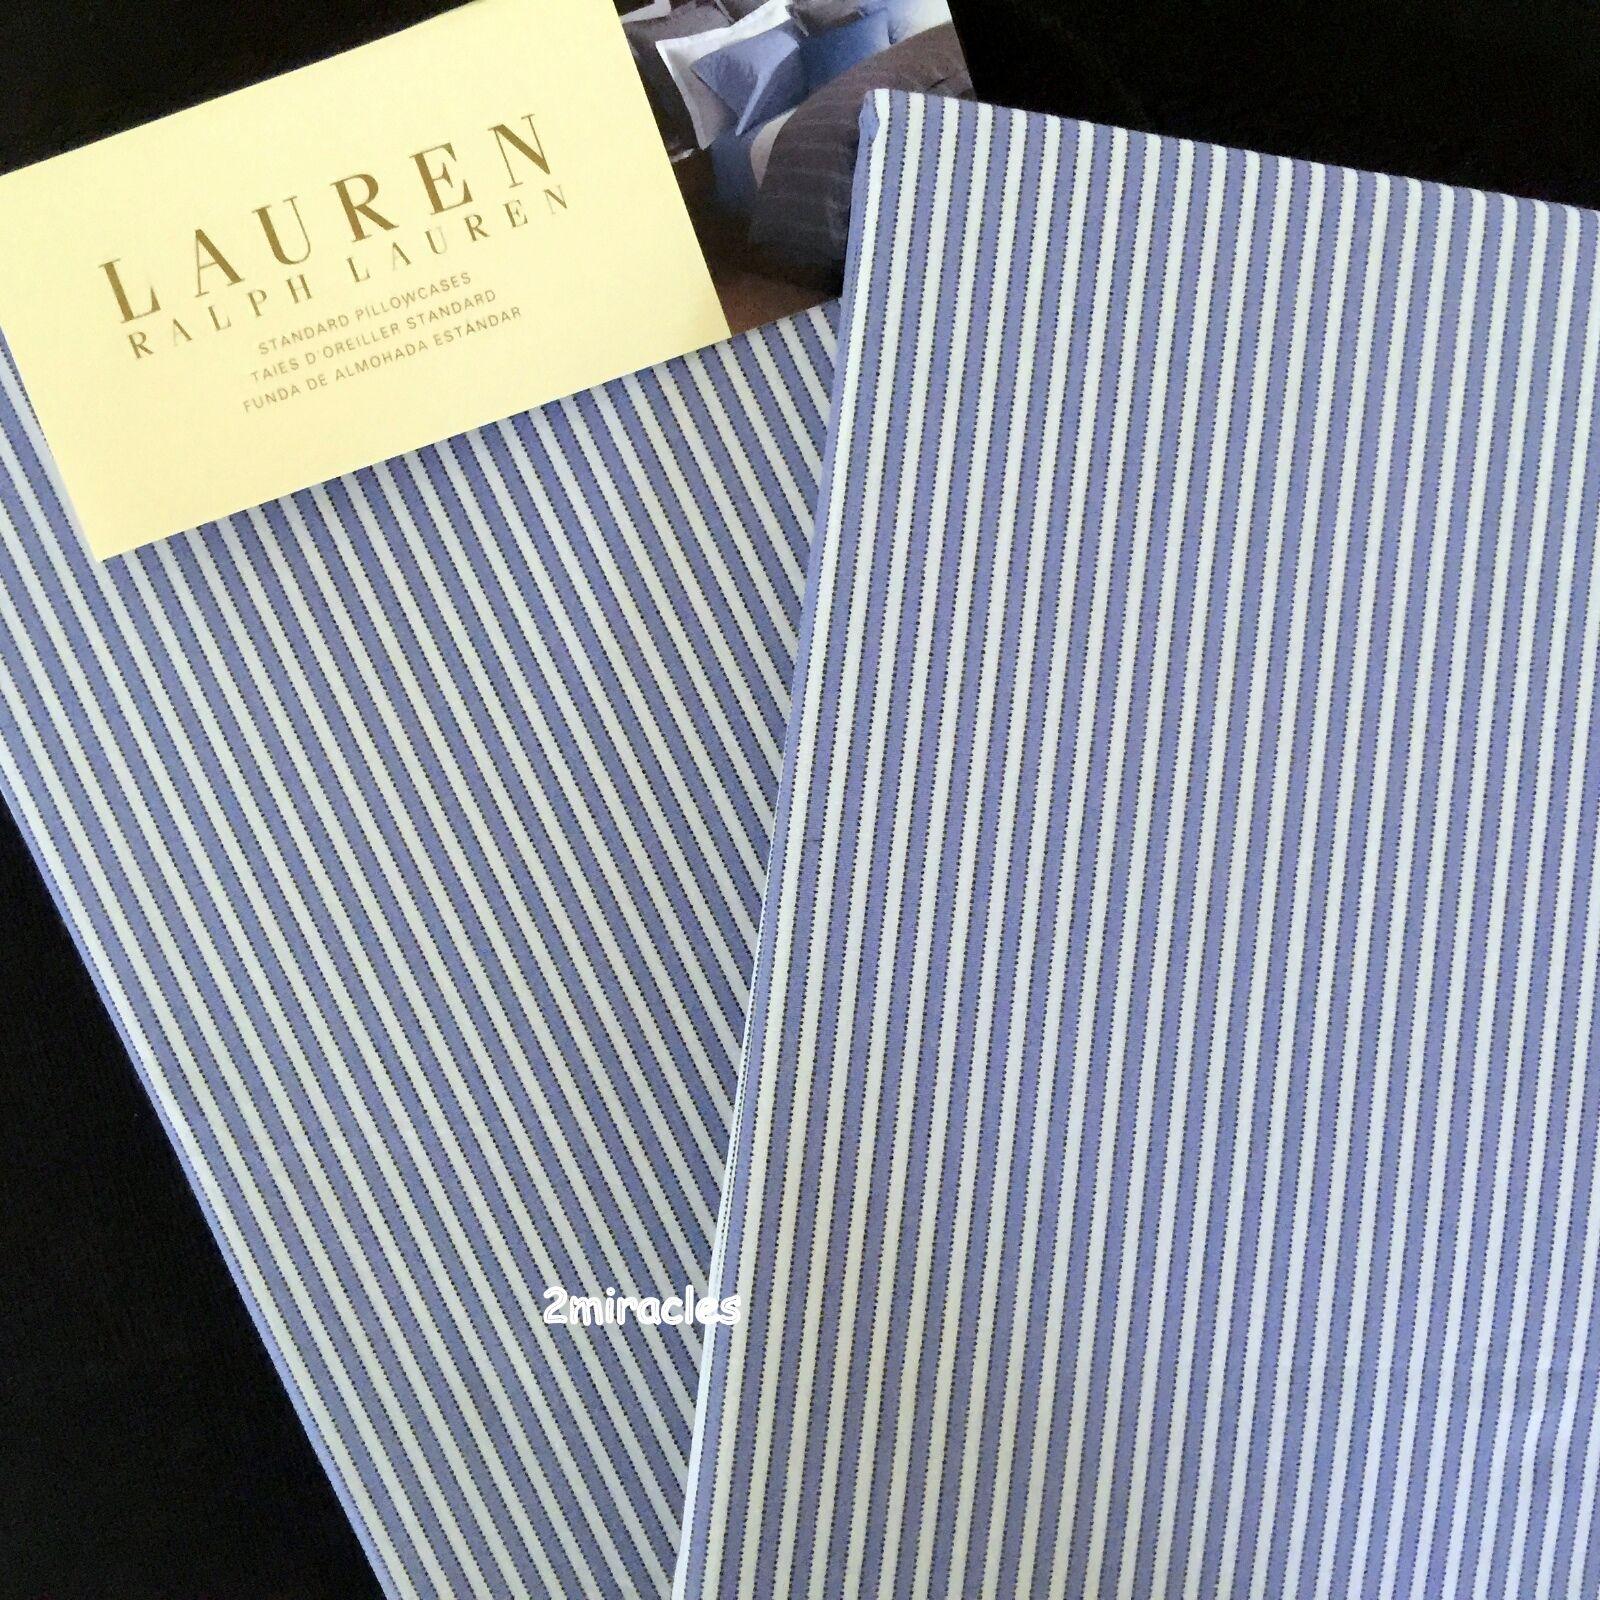 2 Ralph Lauren Standard Jermyn Street Stripe Pillowcases Blau Weiß Cotton RARE